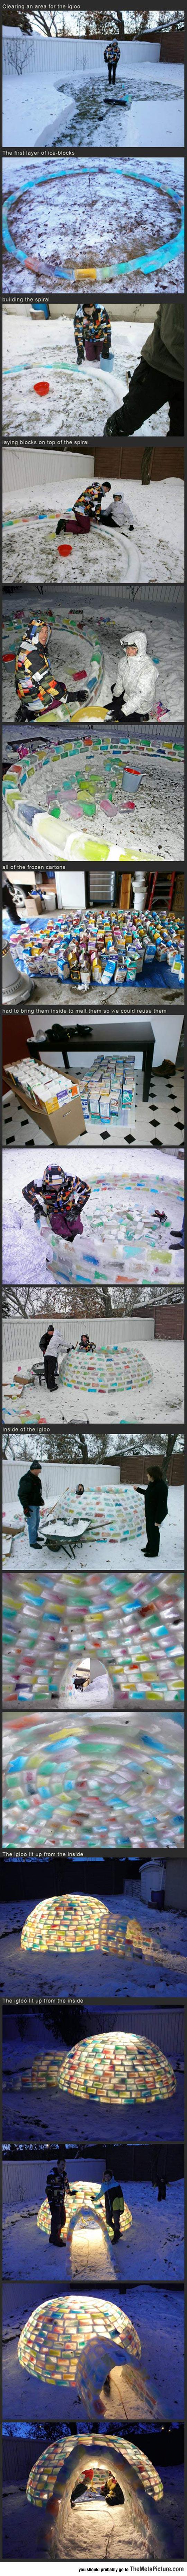 cool-igloo-building-color-bricks-backyard